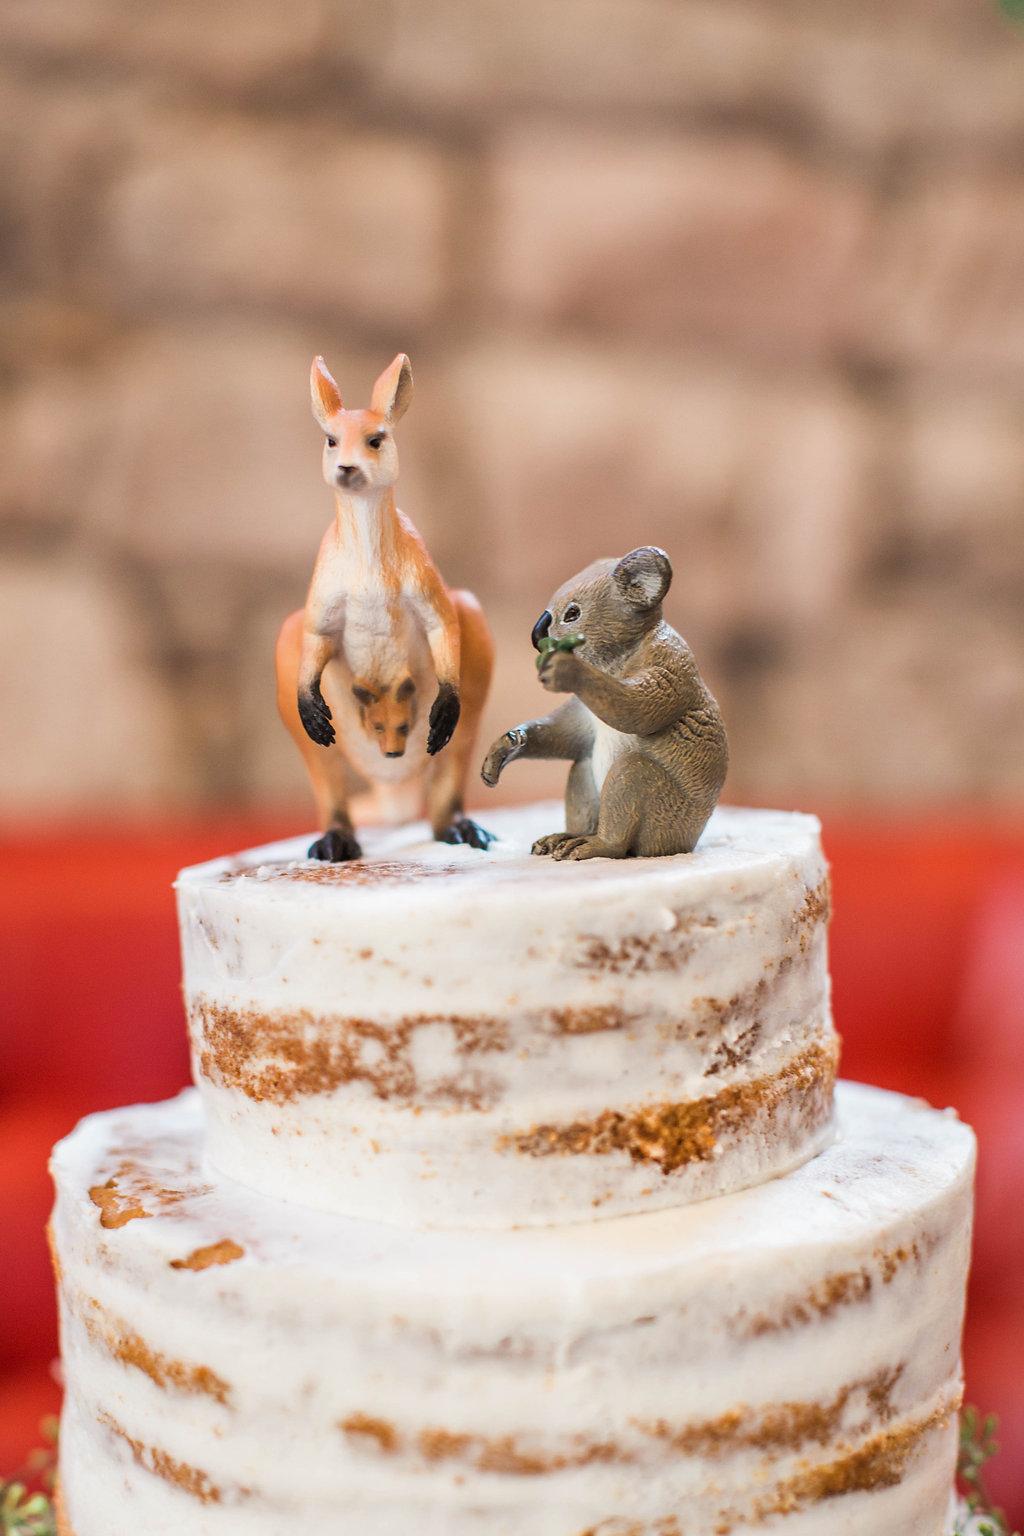 apt-b-photography-ivory-and-beau-bridal-boutique-anna-campbell-isobelle-australian-wedding-the-collins-quarter-savannah-wedding-savannah-weddings-savannah-florist-savannah-bridal-savannah-event-designer-savannah-wedding-dresses-outback-wedding-7.jpg